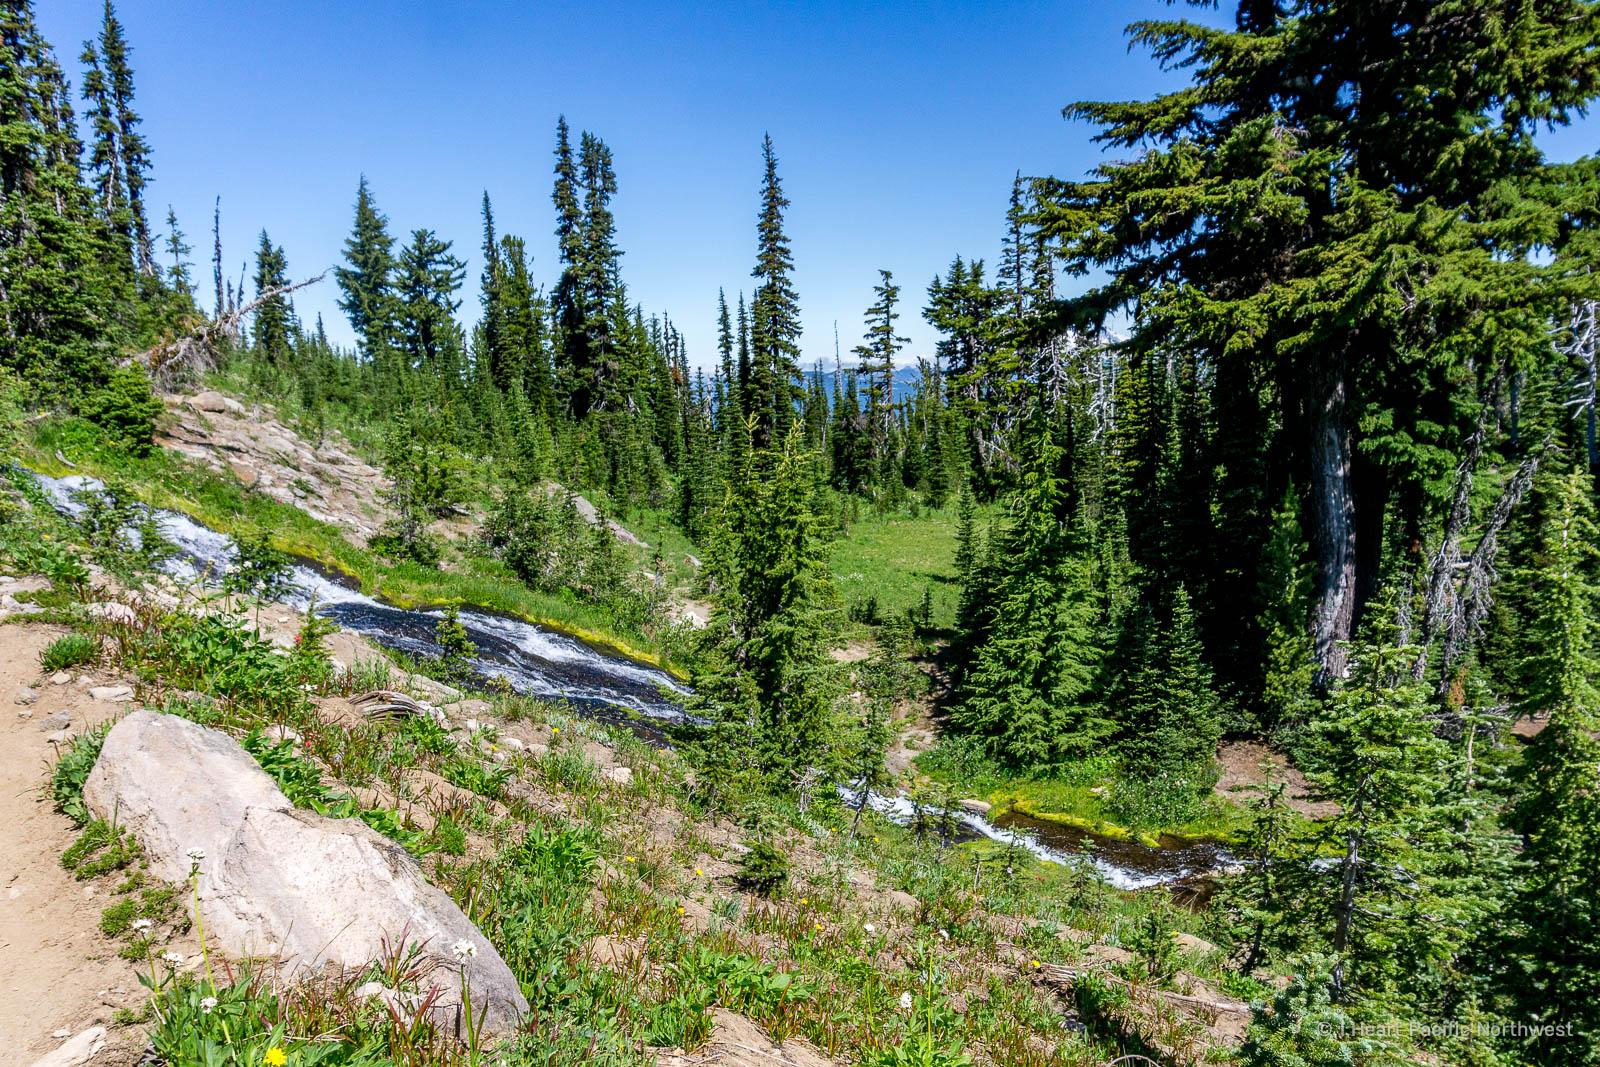 Mount Adams - Killen Creek backpacking trip